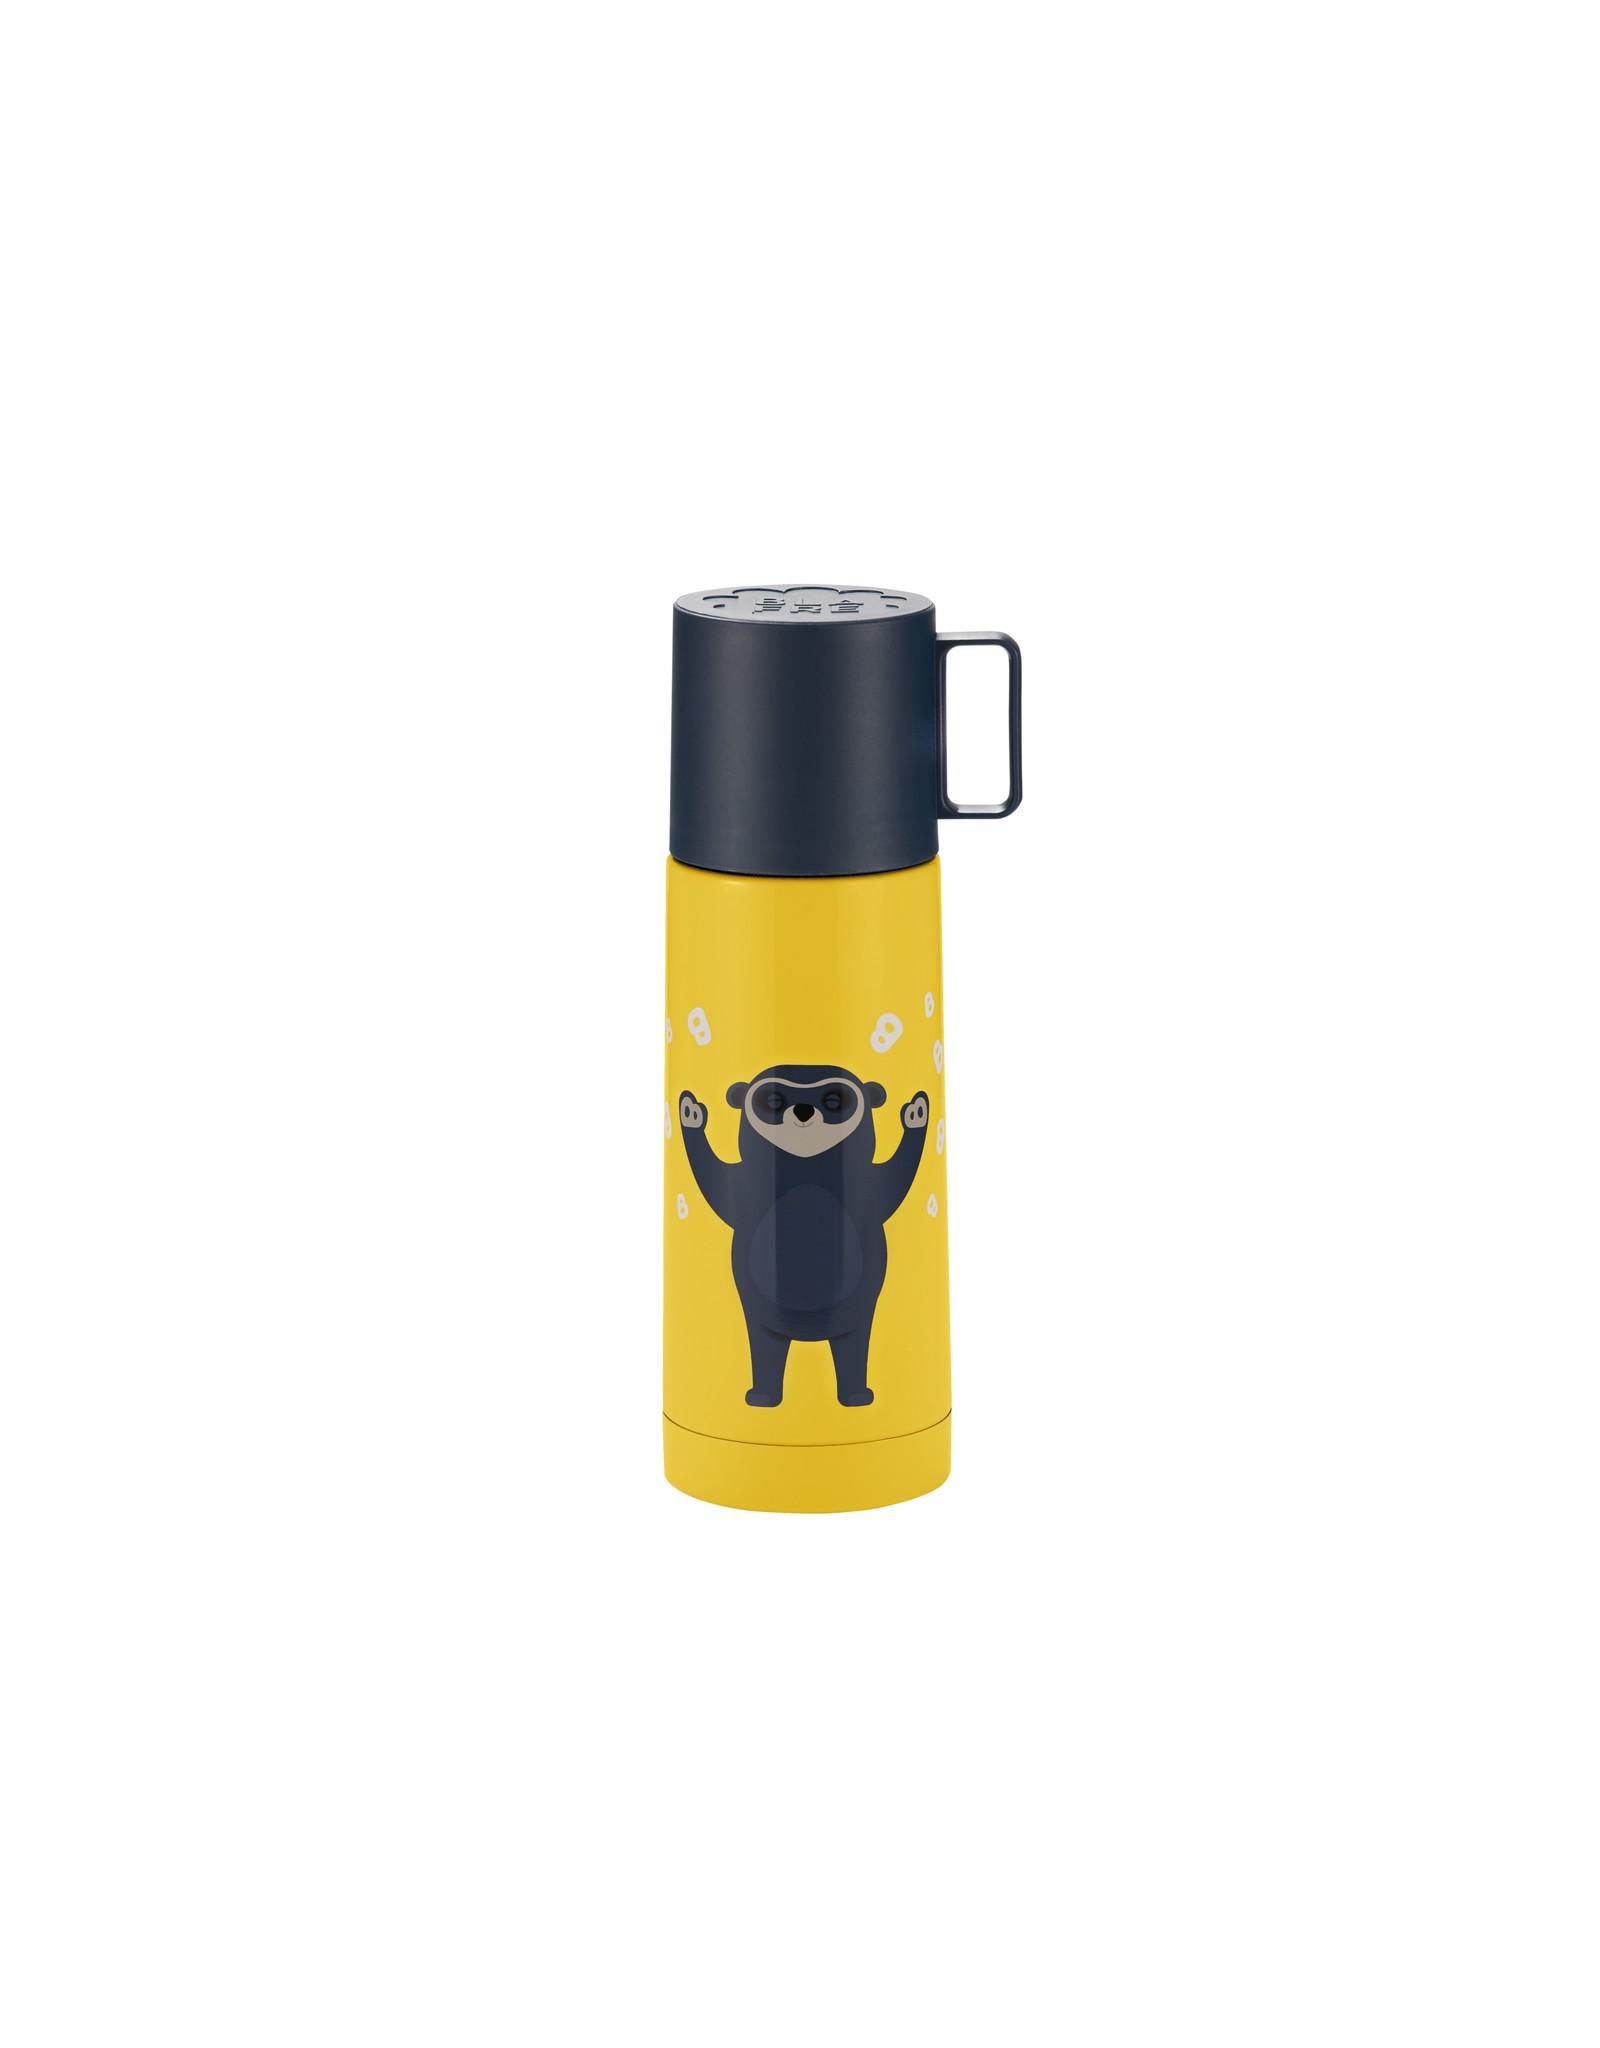 BLAFRE Blafre bouteille isotherme acier inoxydable 350ml Bo Bear jaune